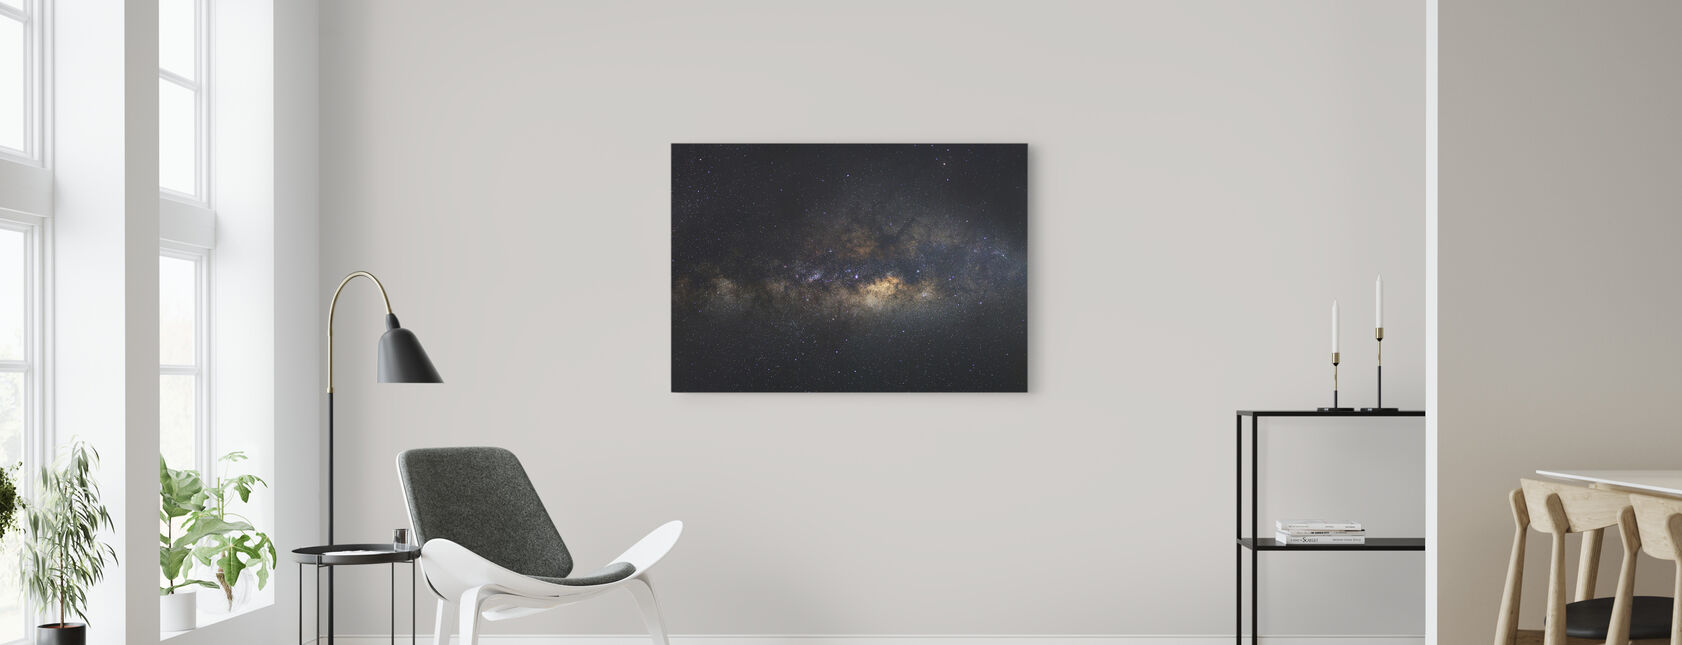 Melkeveien Galaxy - Lang Eksponering - Lerretsbilde - Stue